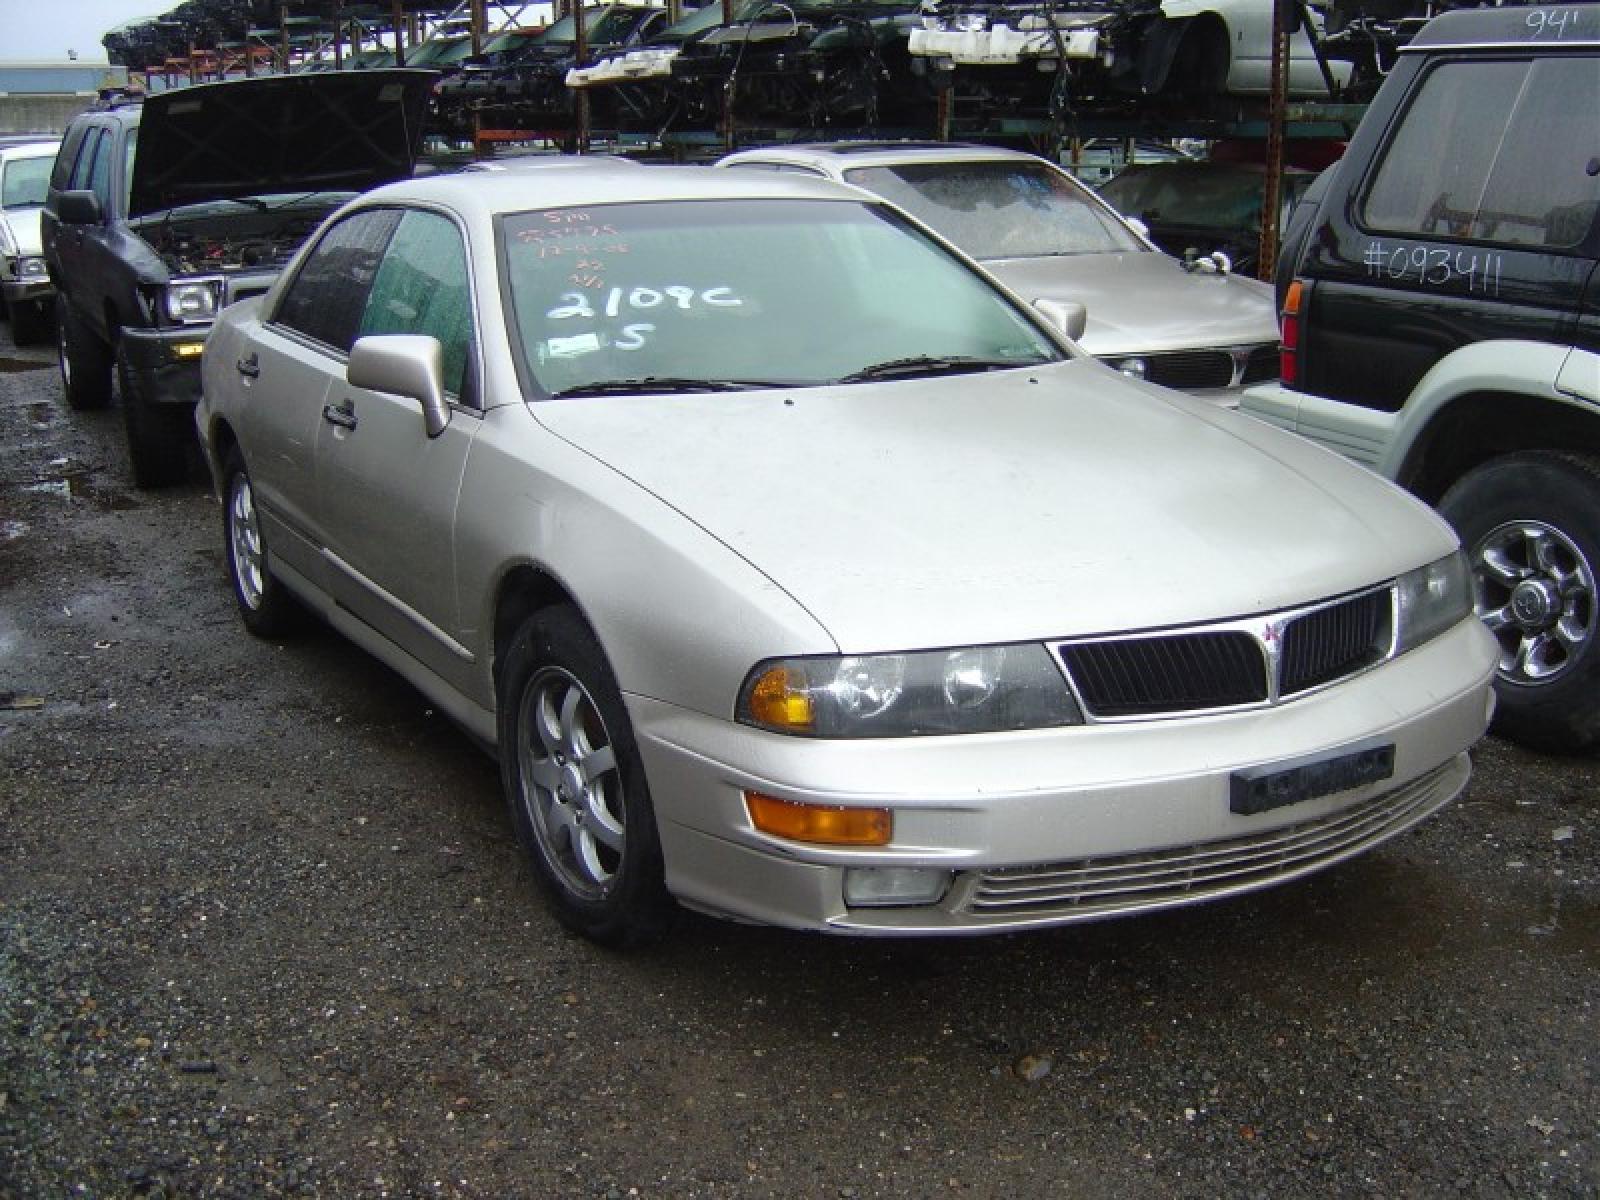 1997 Mitsubishi Diamante #1 800 1024 1280 1600 origin